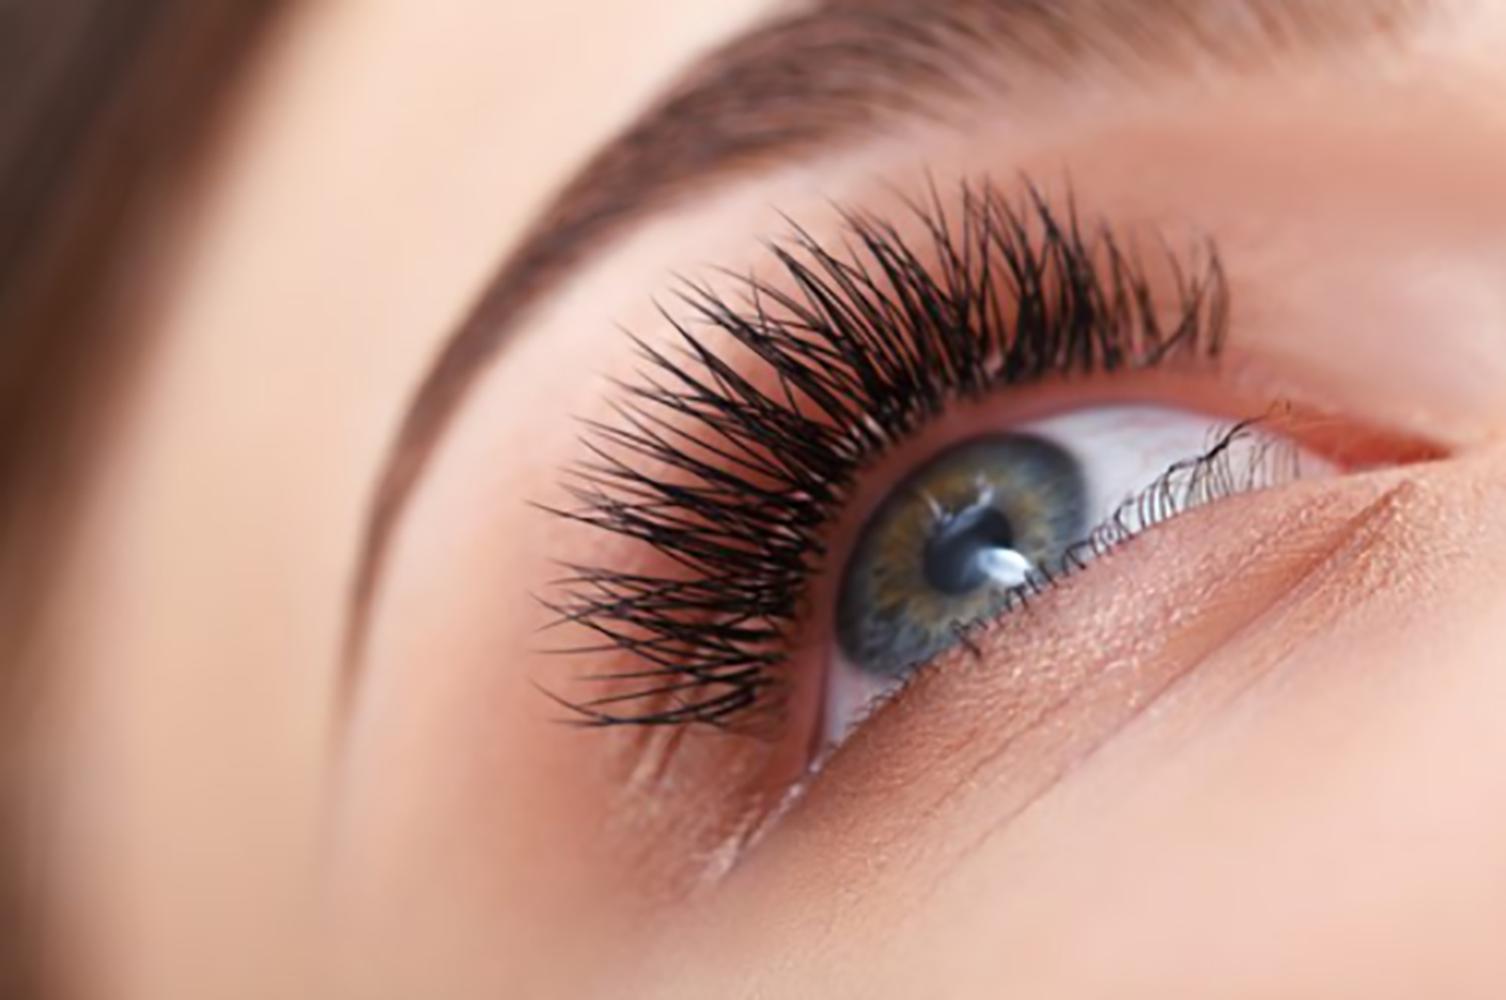 RodanandField LASH Serum-Eyelash growth